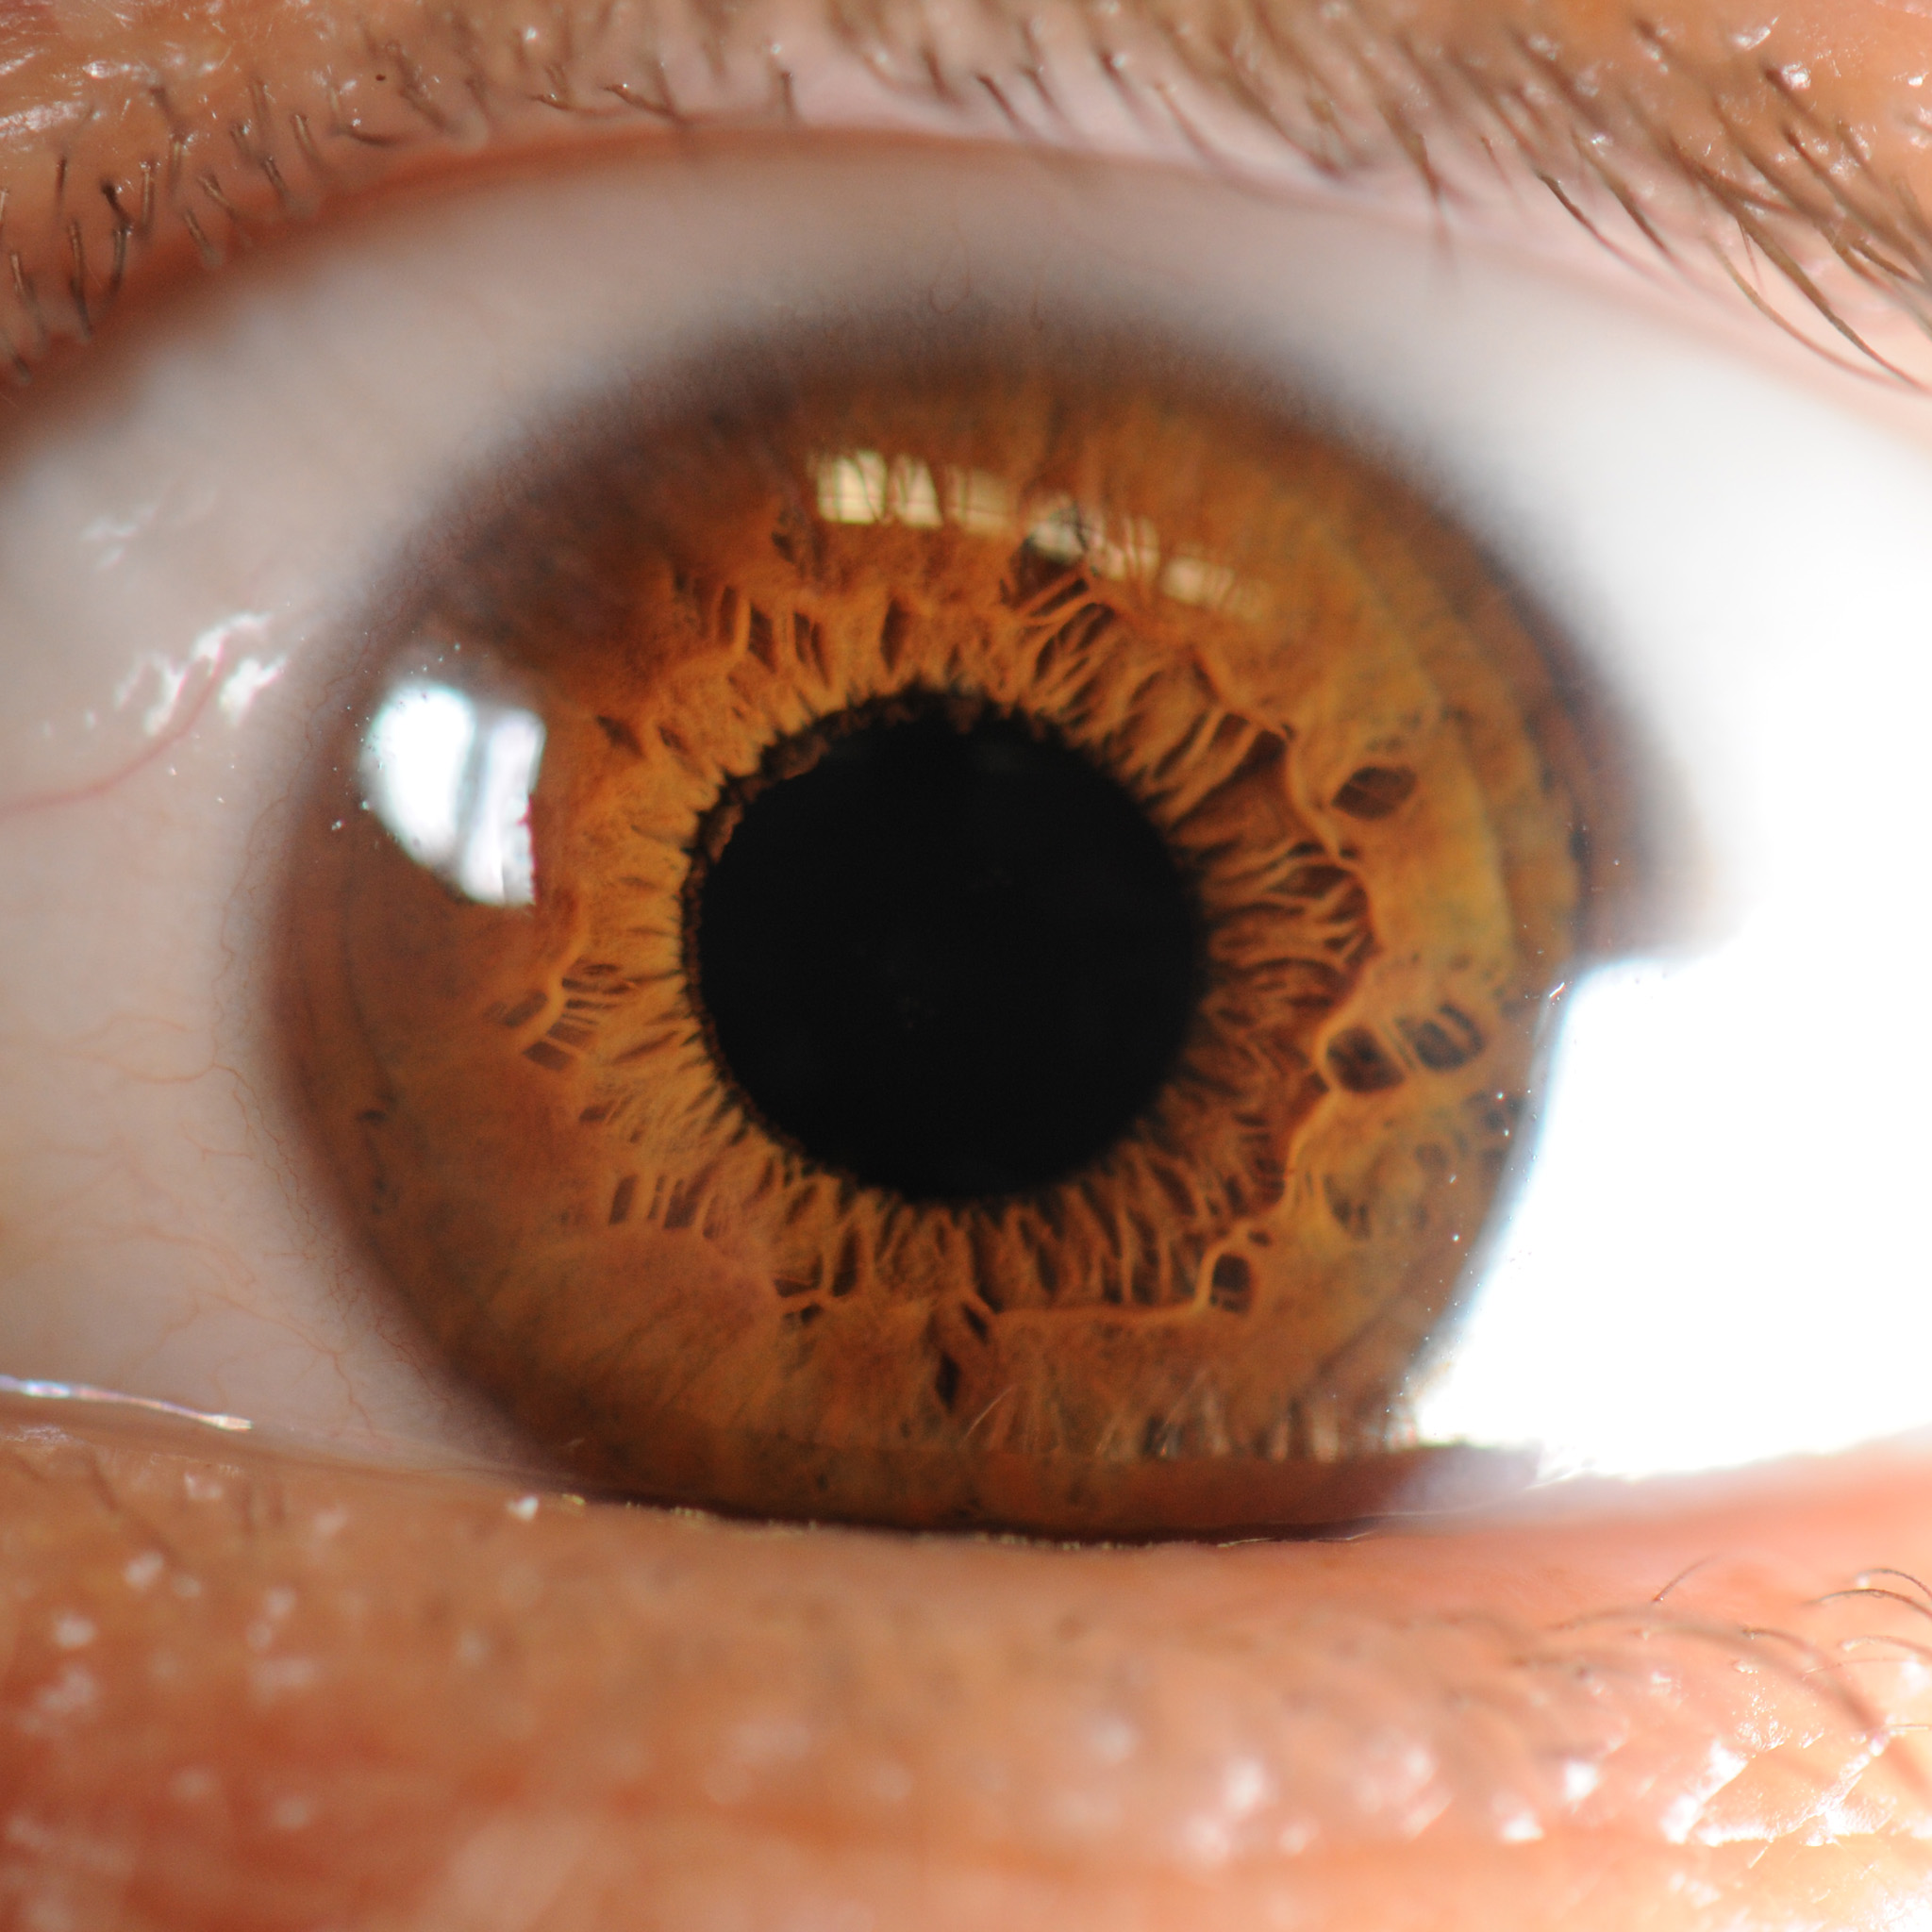 File:Iris of the Human Eye.jpg - Wikimedia Commons